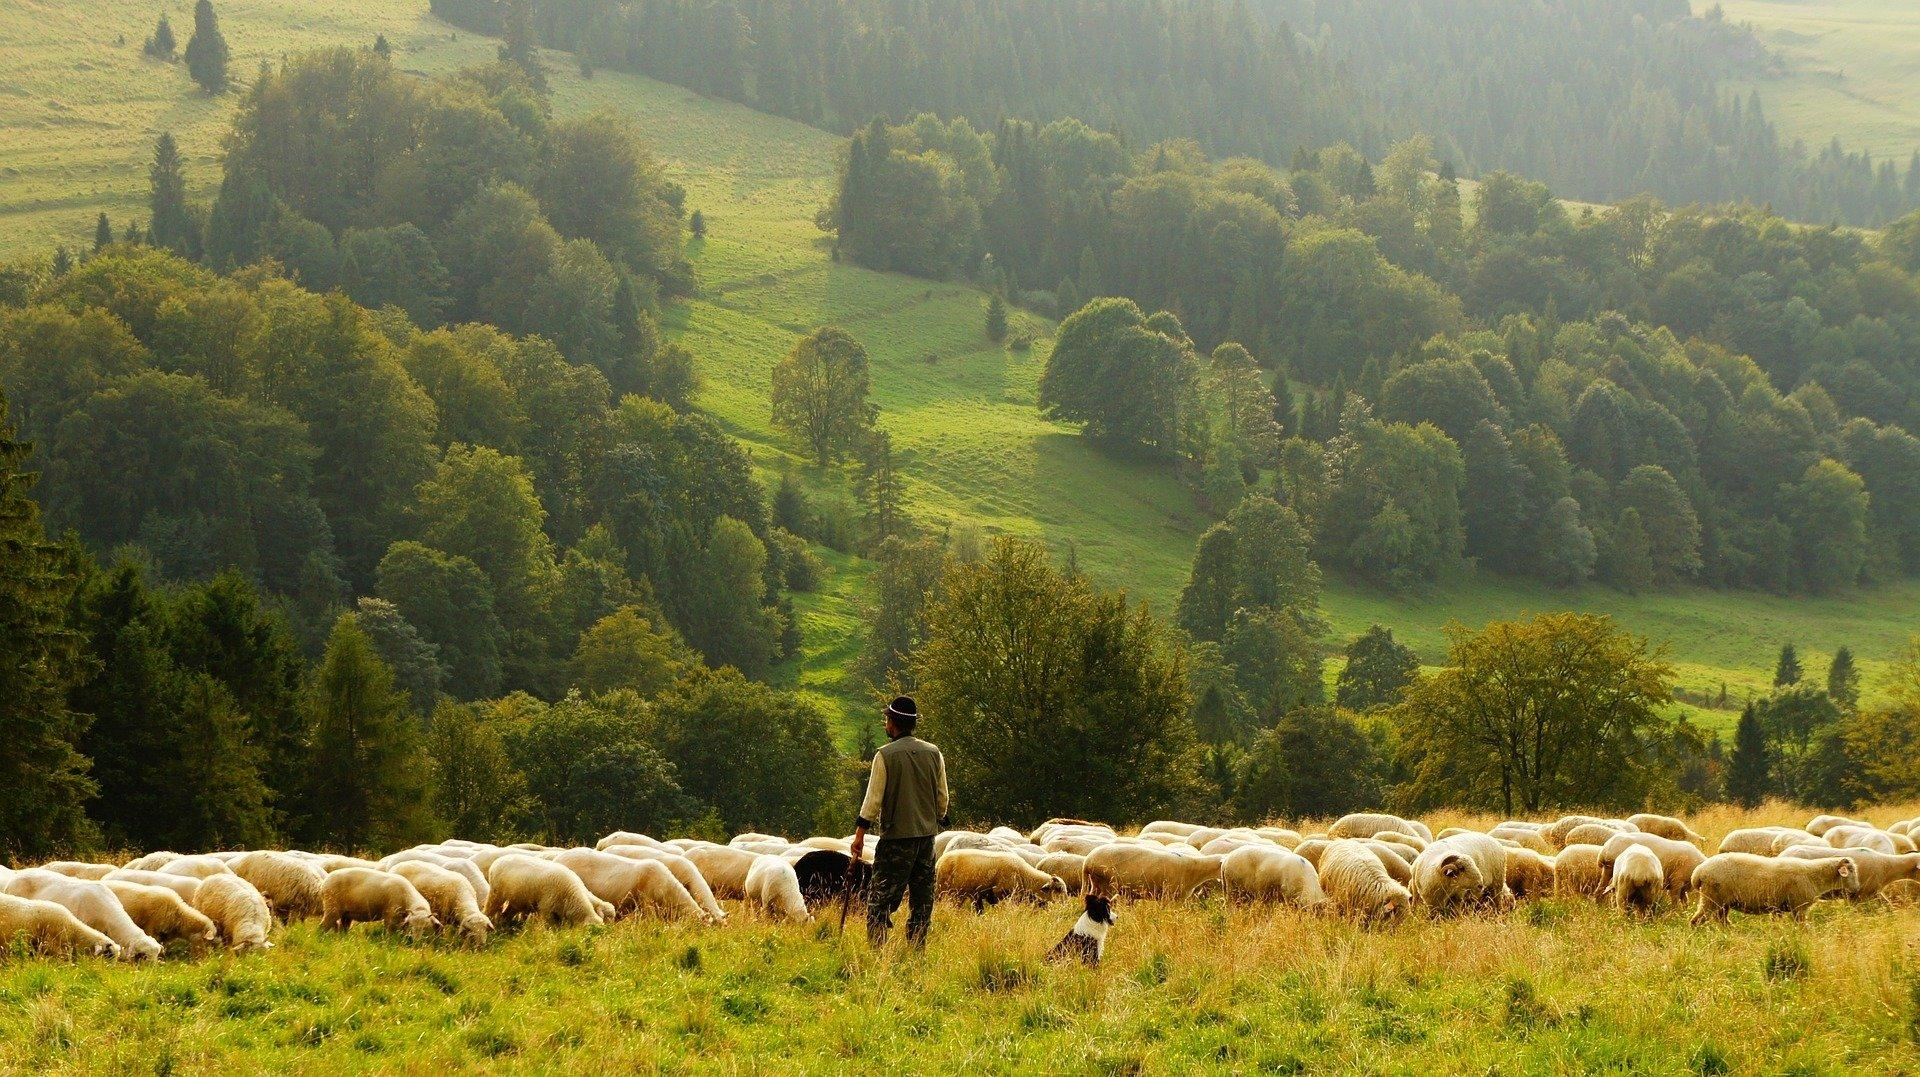 Europe needs more Farmers